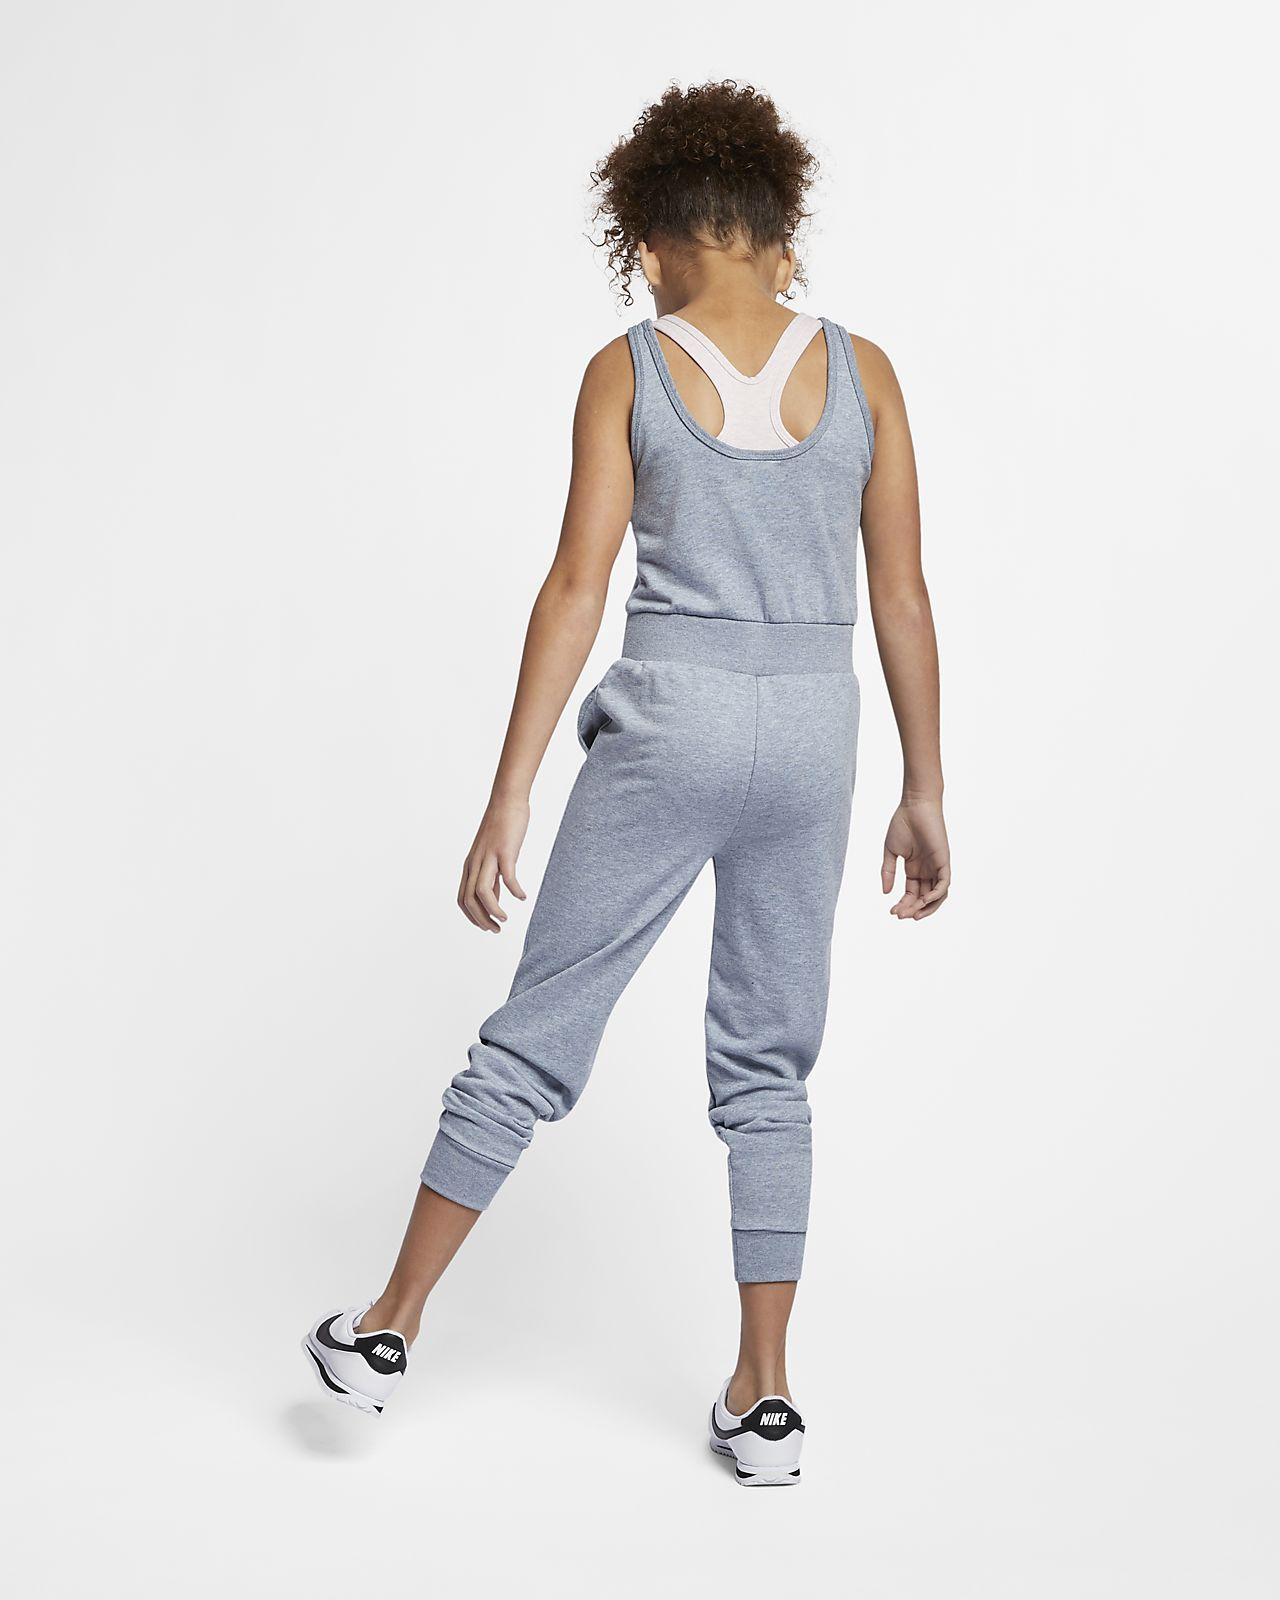 c0e92ee63 Nike Air Big Kids' (Girls') Jumpsuit. Nike.com